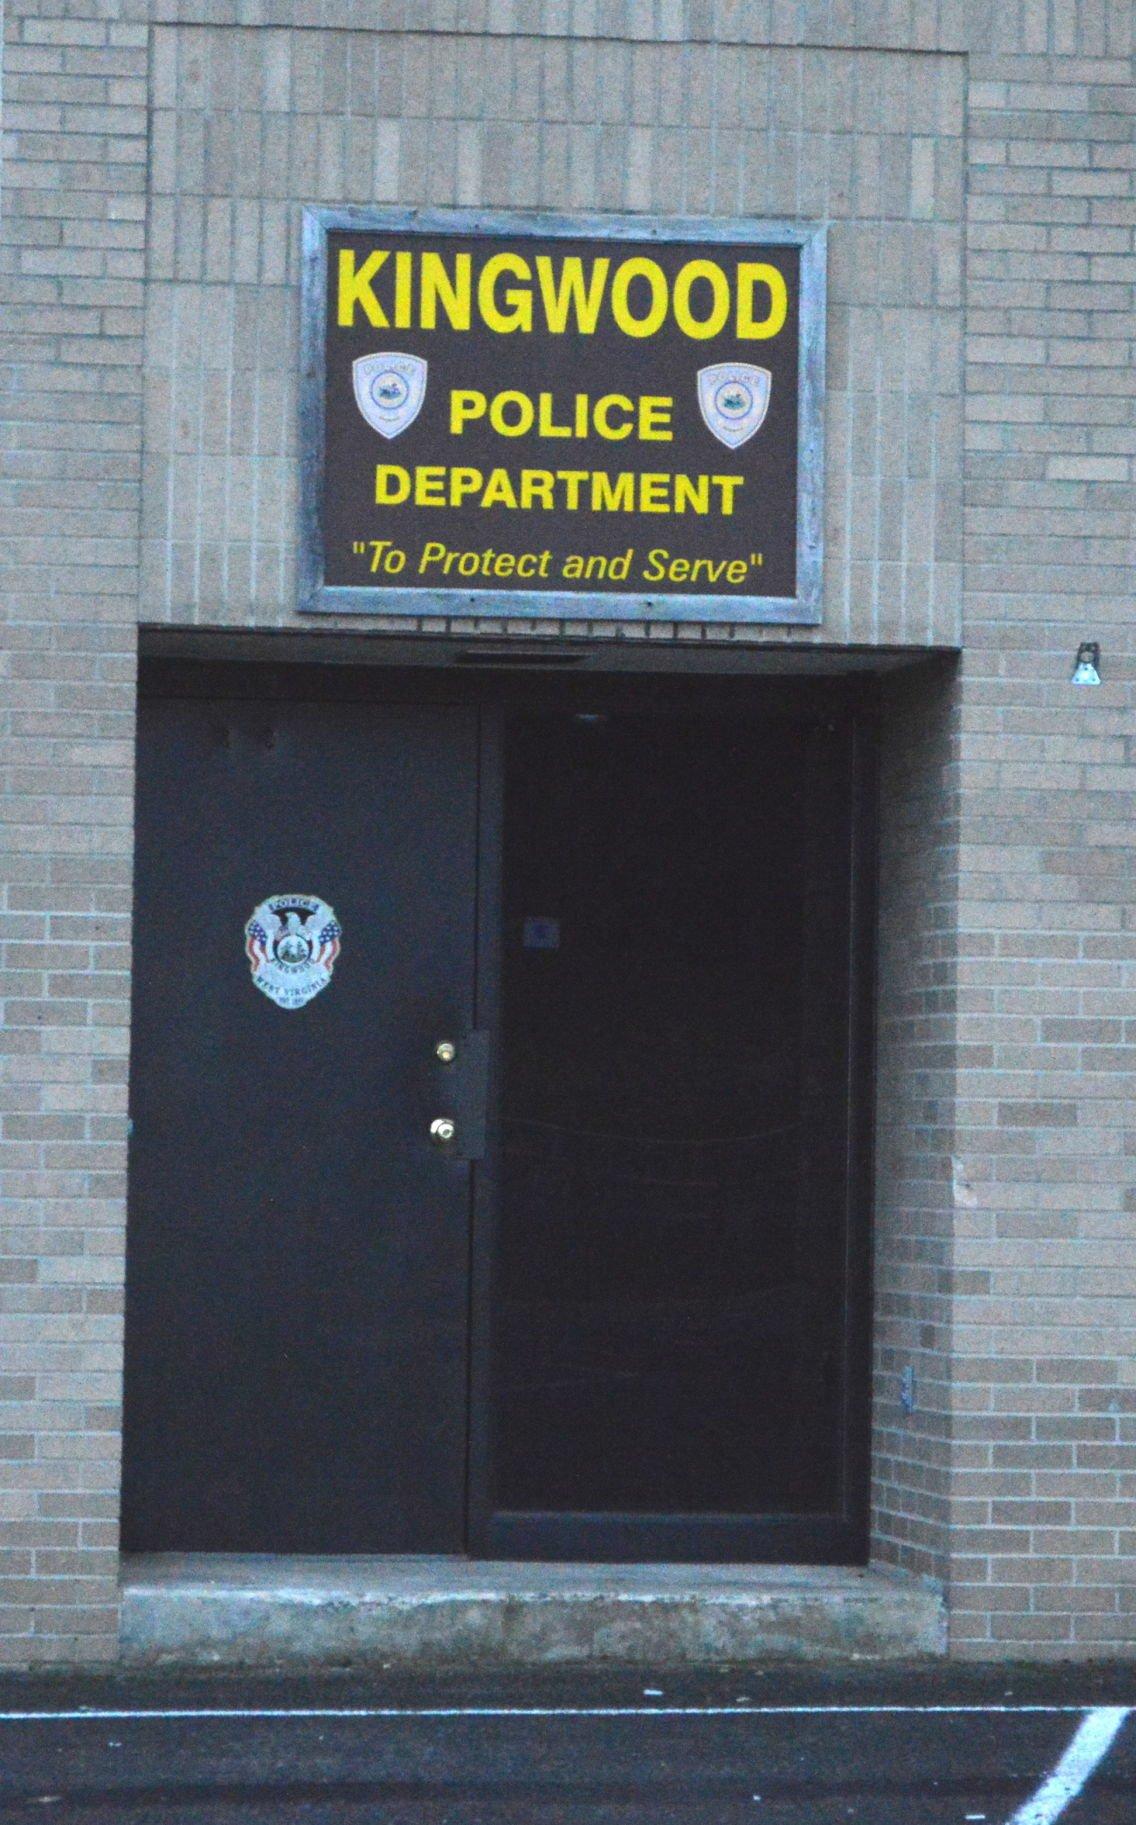 Kingwood Police Department